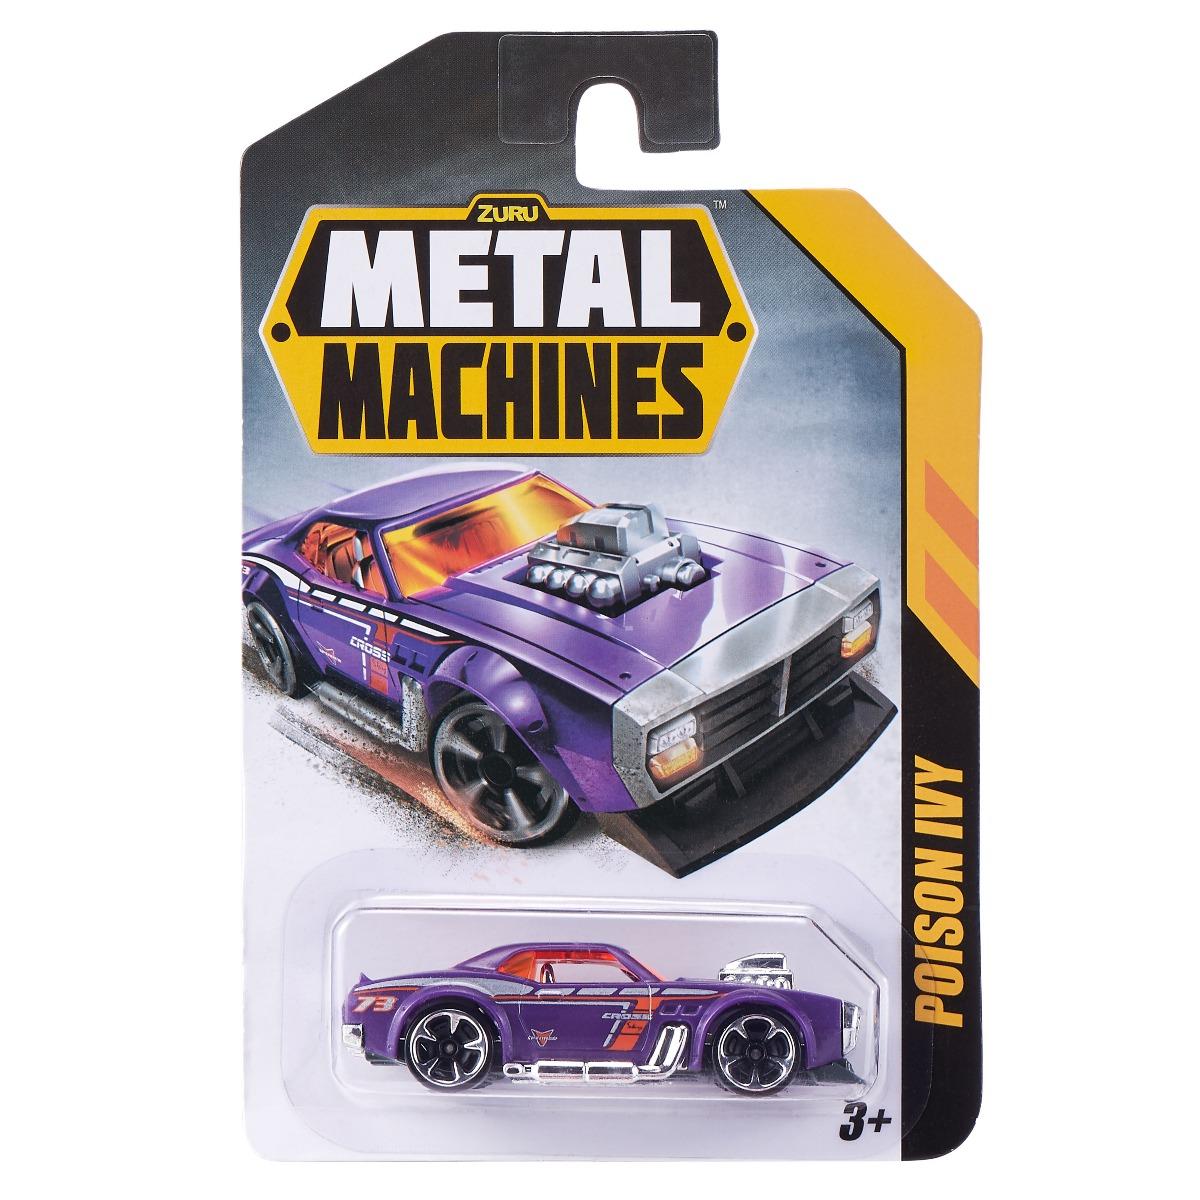 Masinuta Metal Machines Poison Ivy, 1:64, Mov